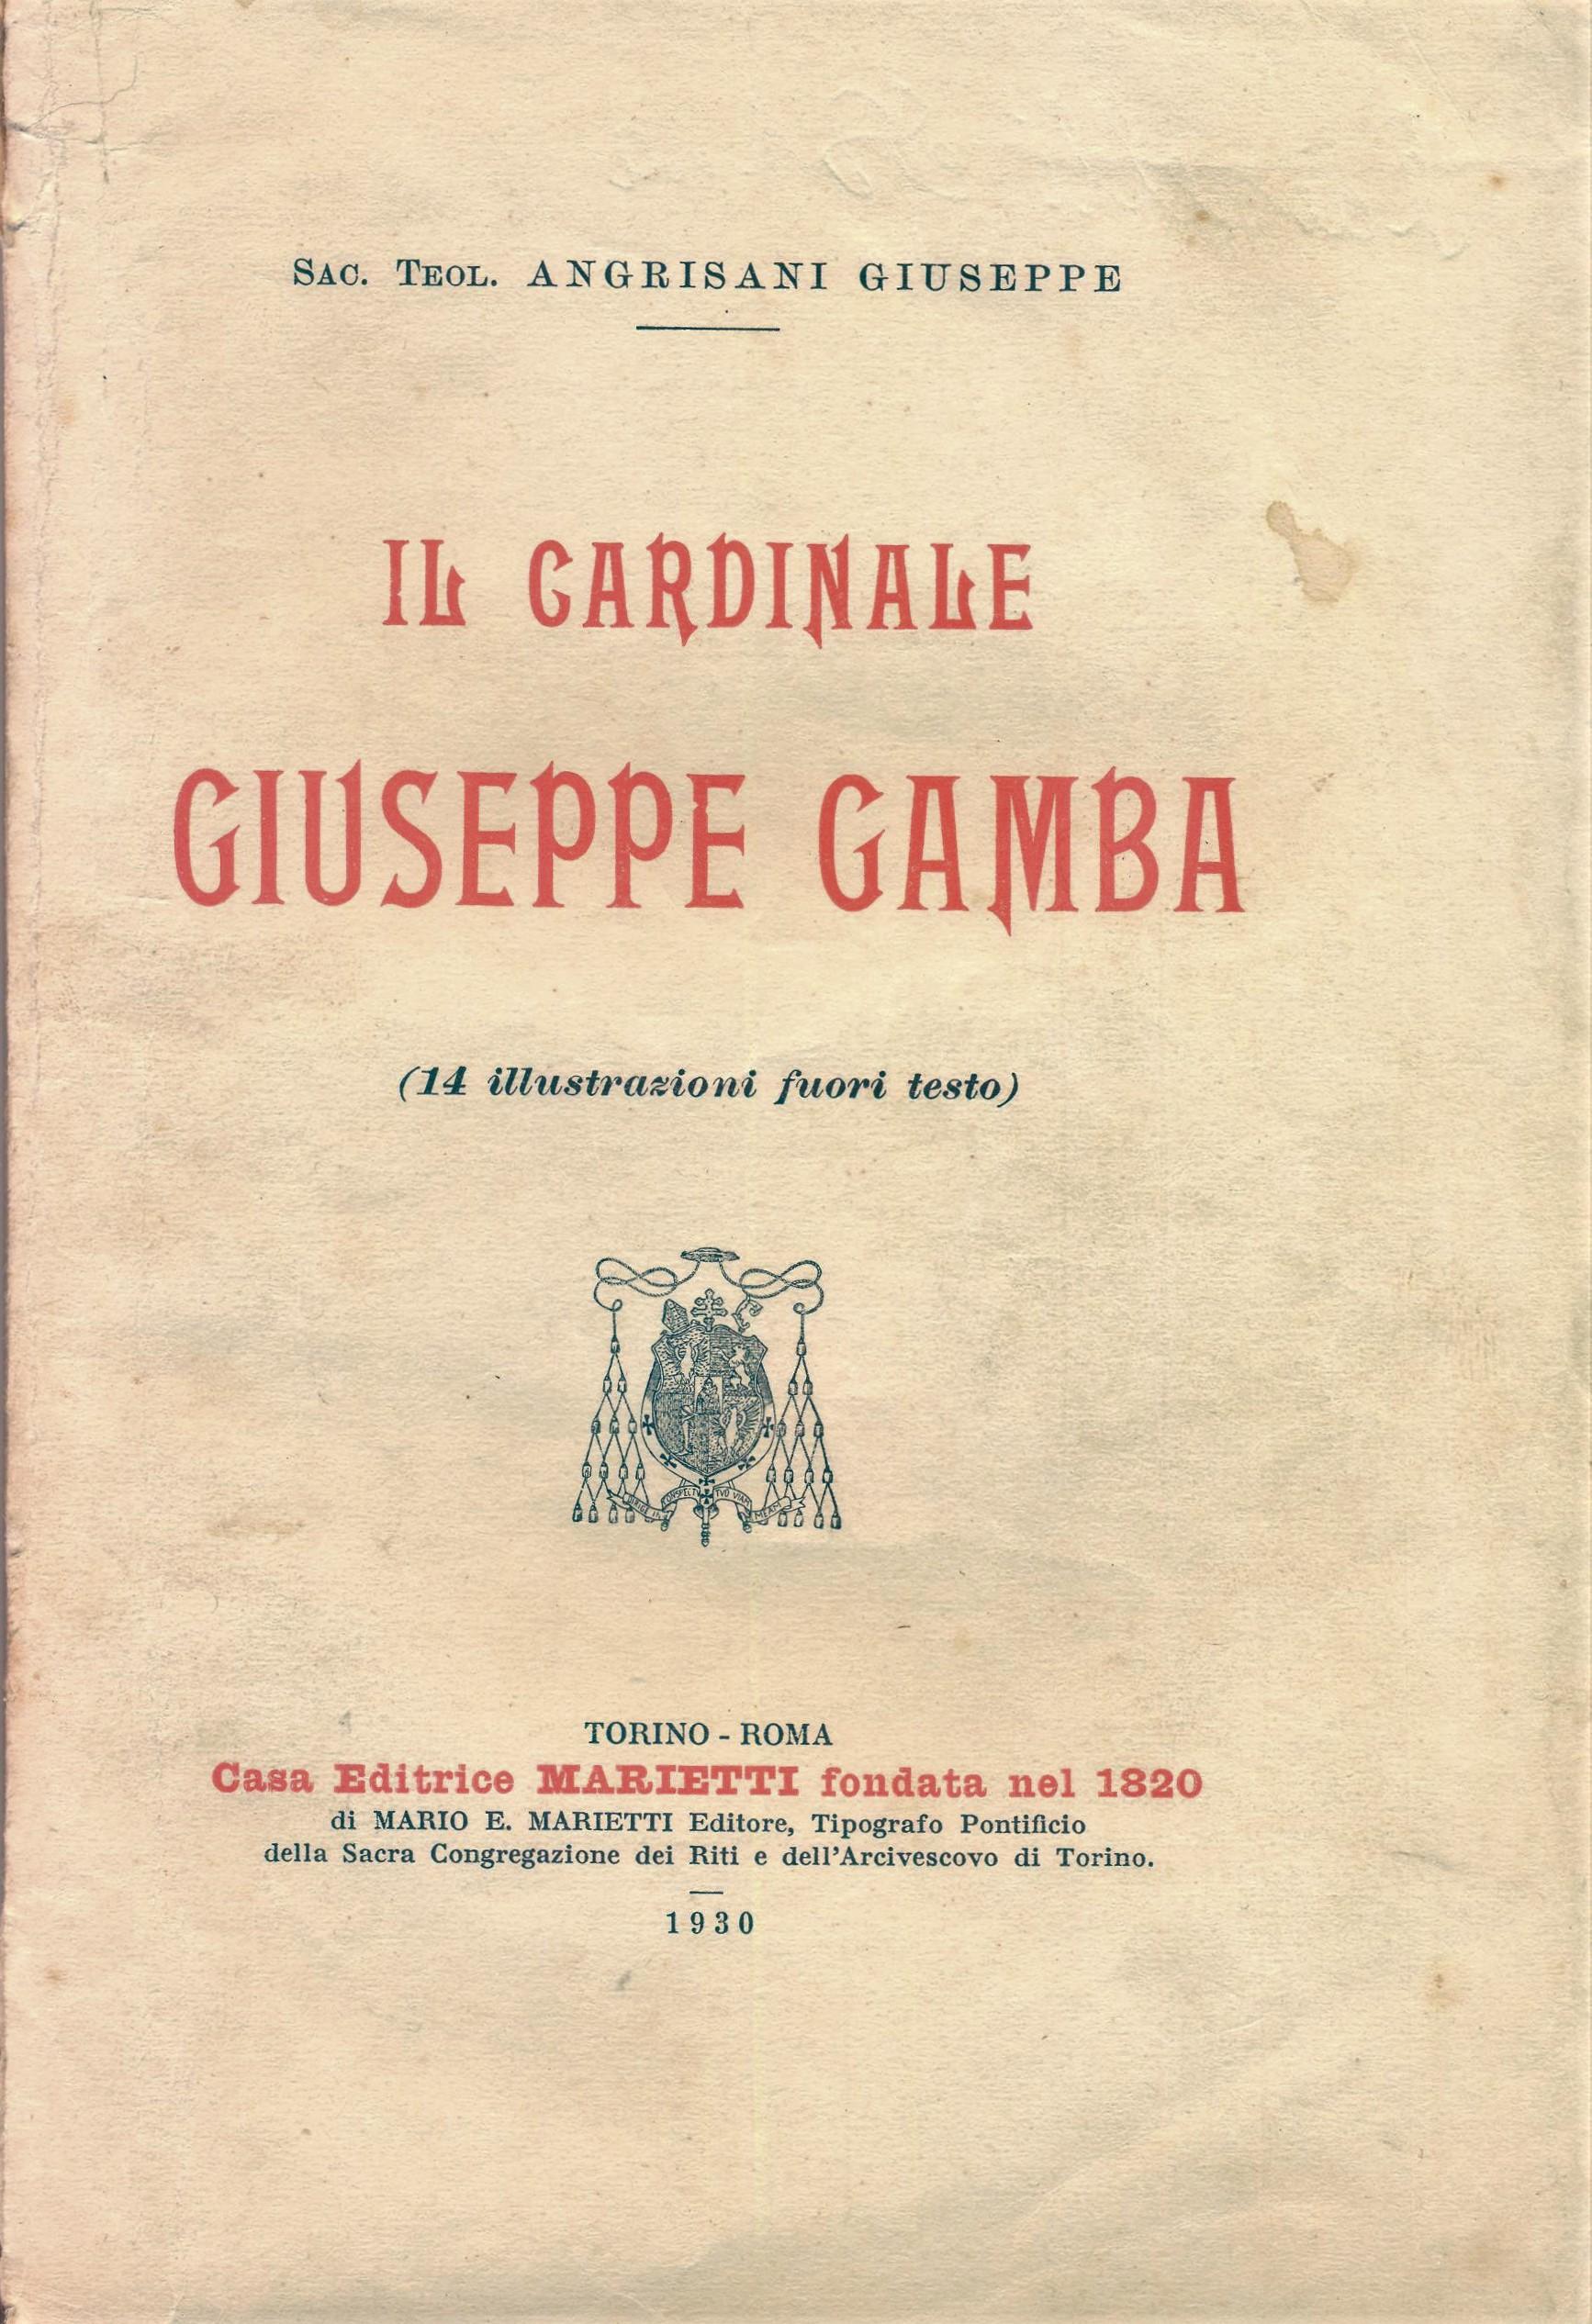 Il Cardinale Giuseppe Gamba